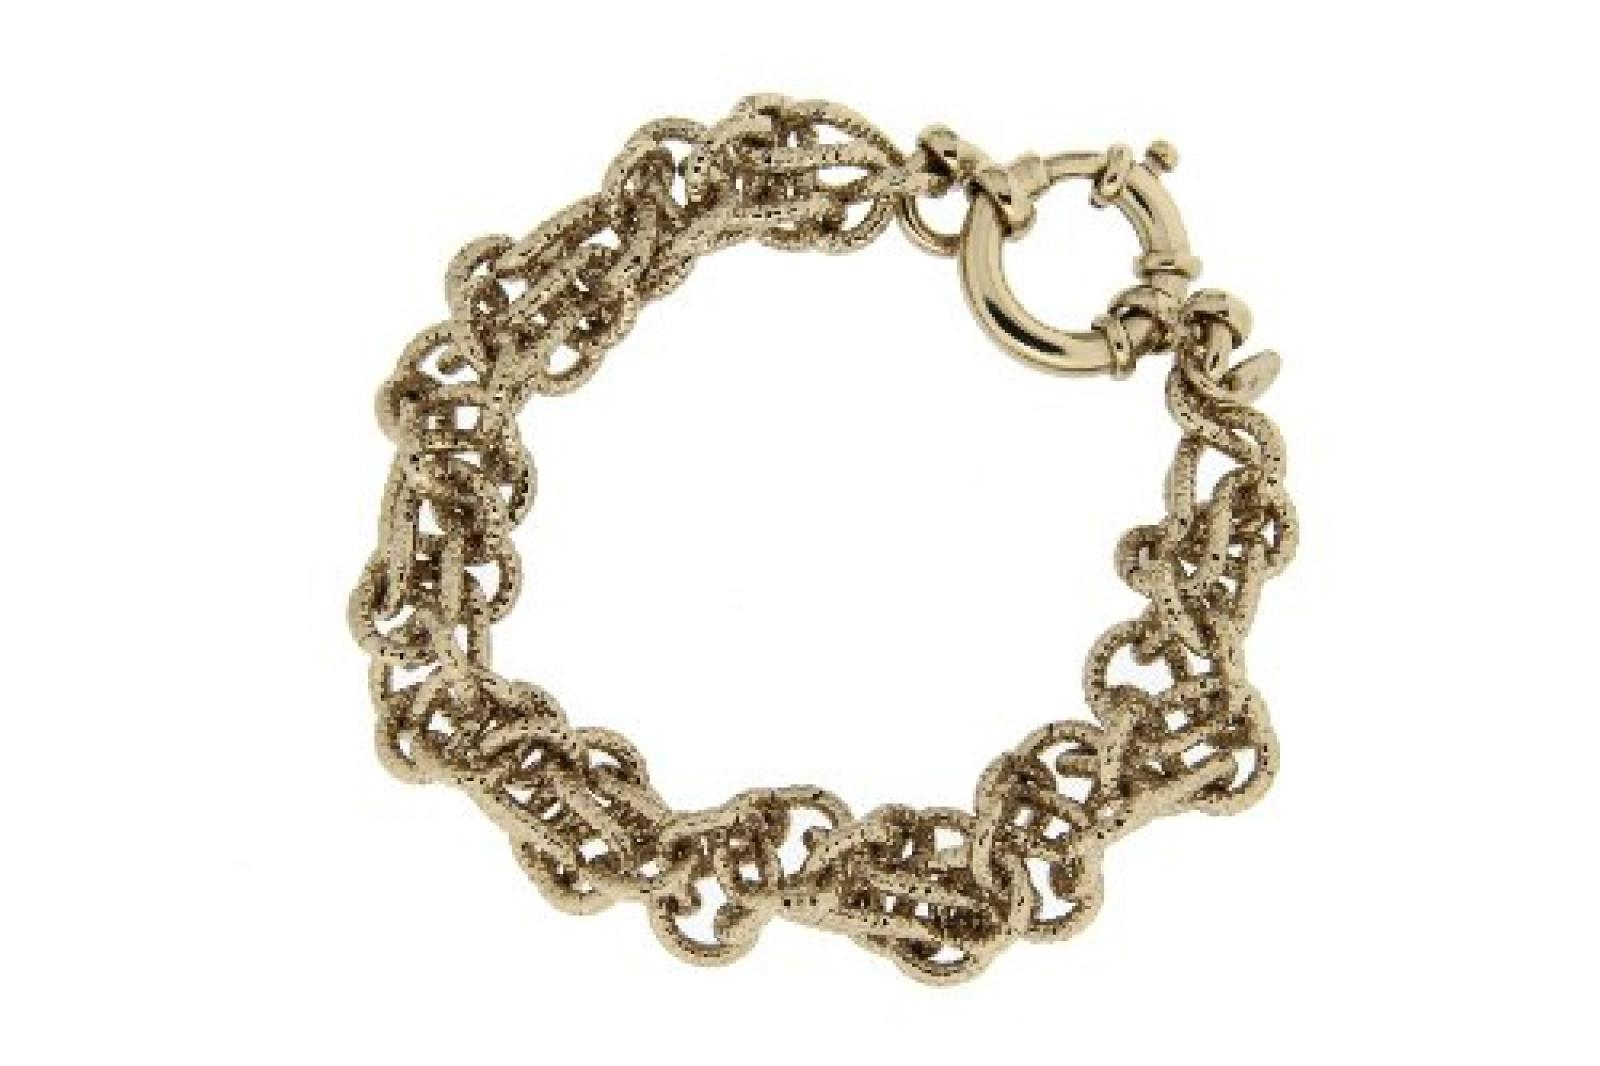 Kettenworld Damen Armband Bronze 22.0 cm 266136